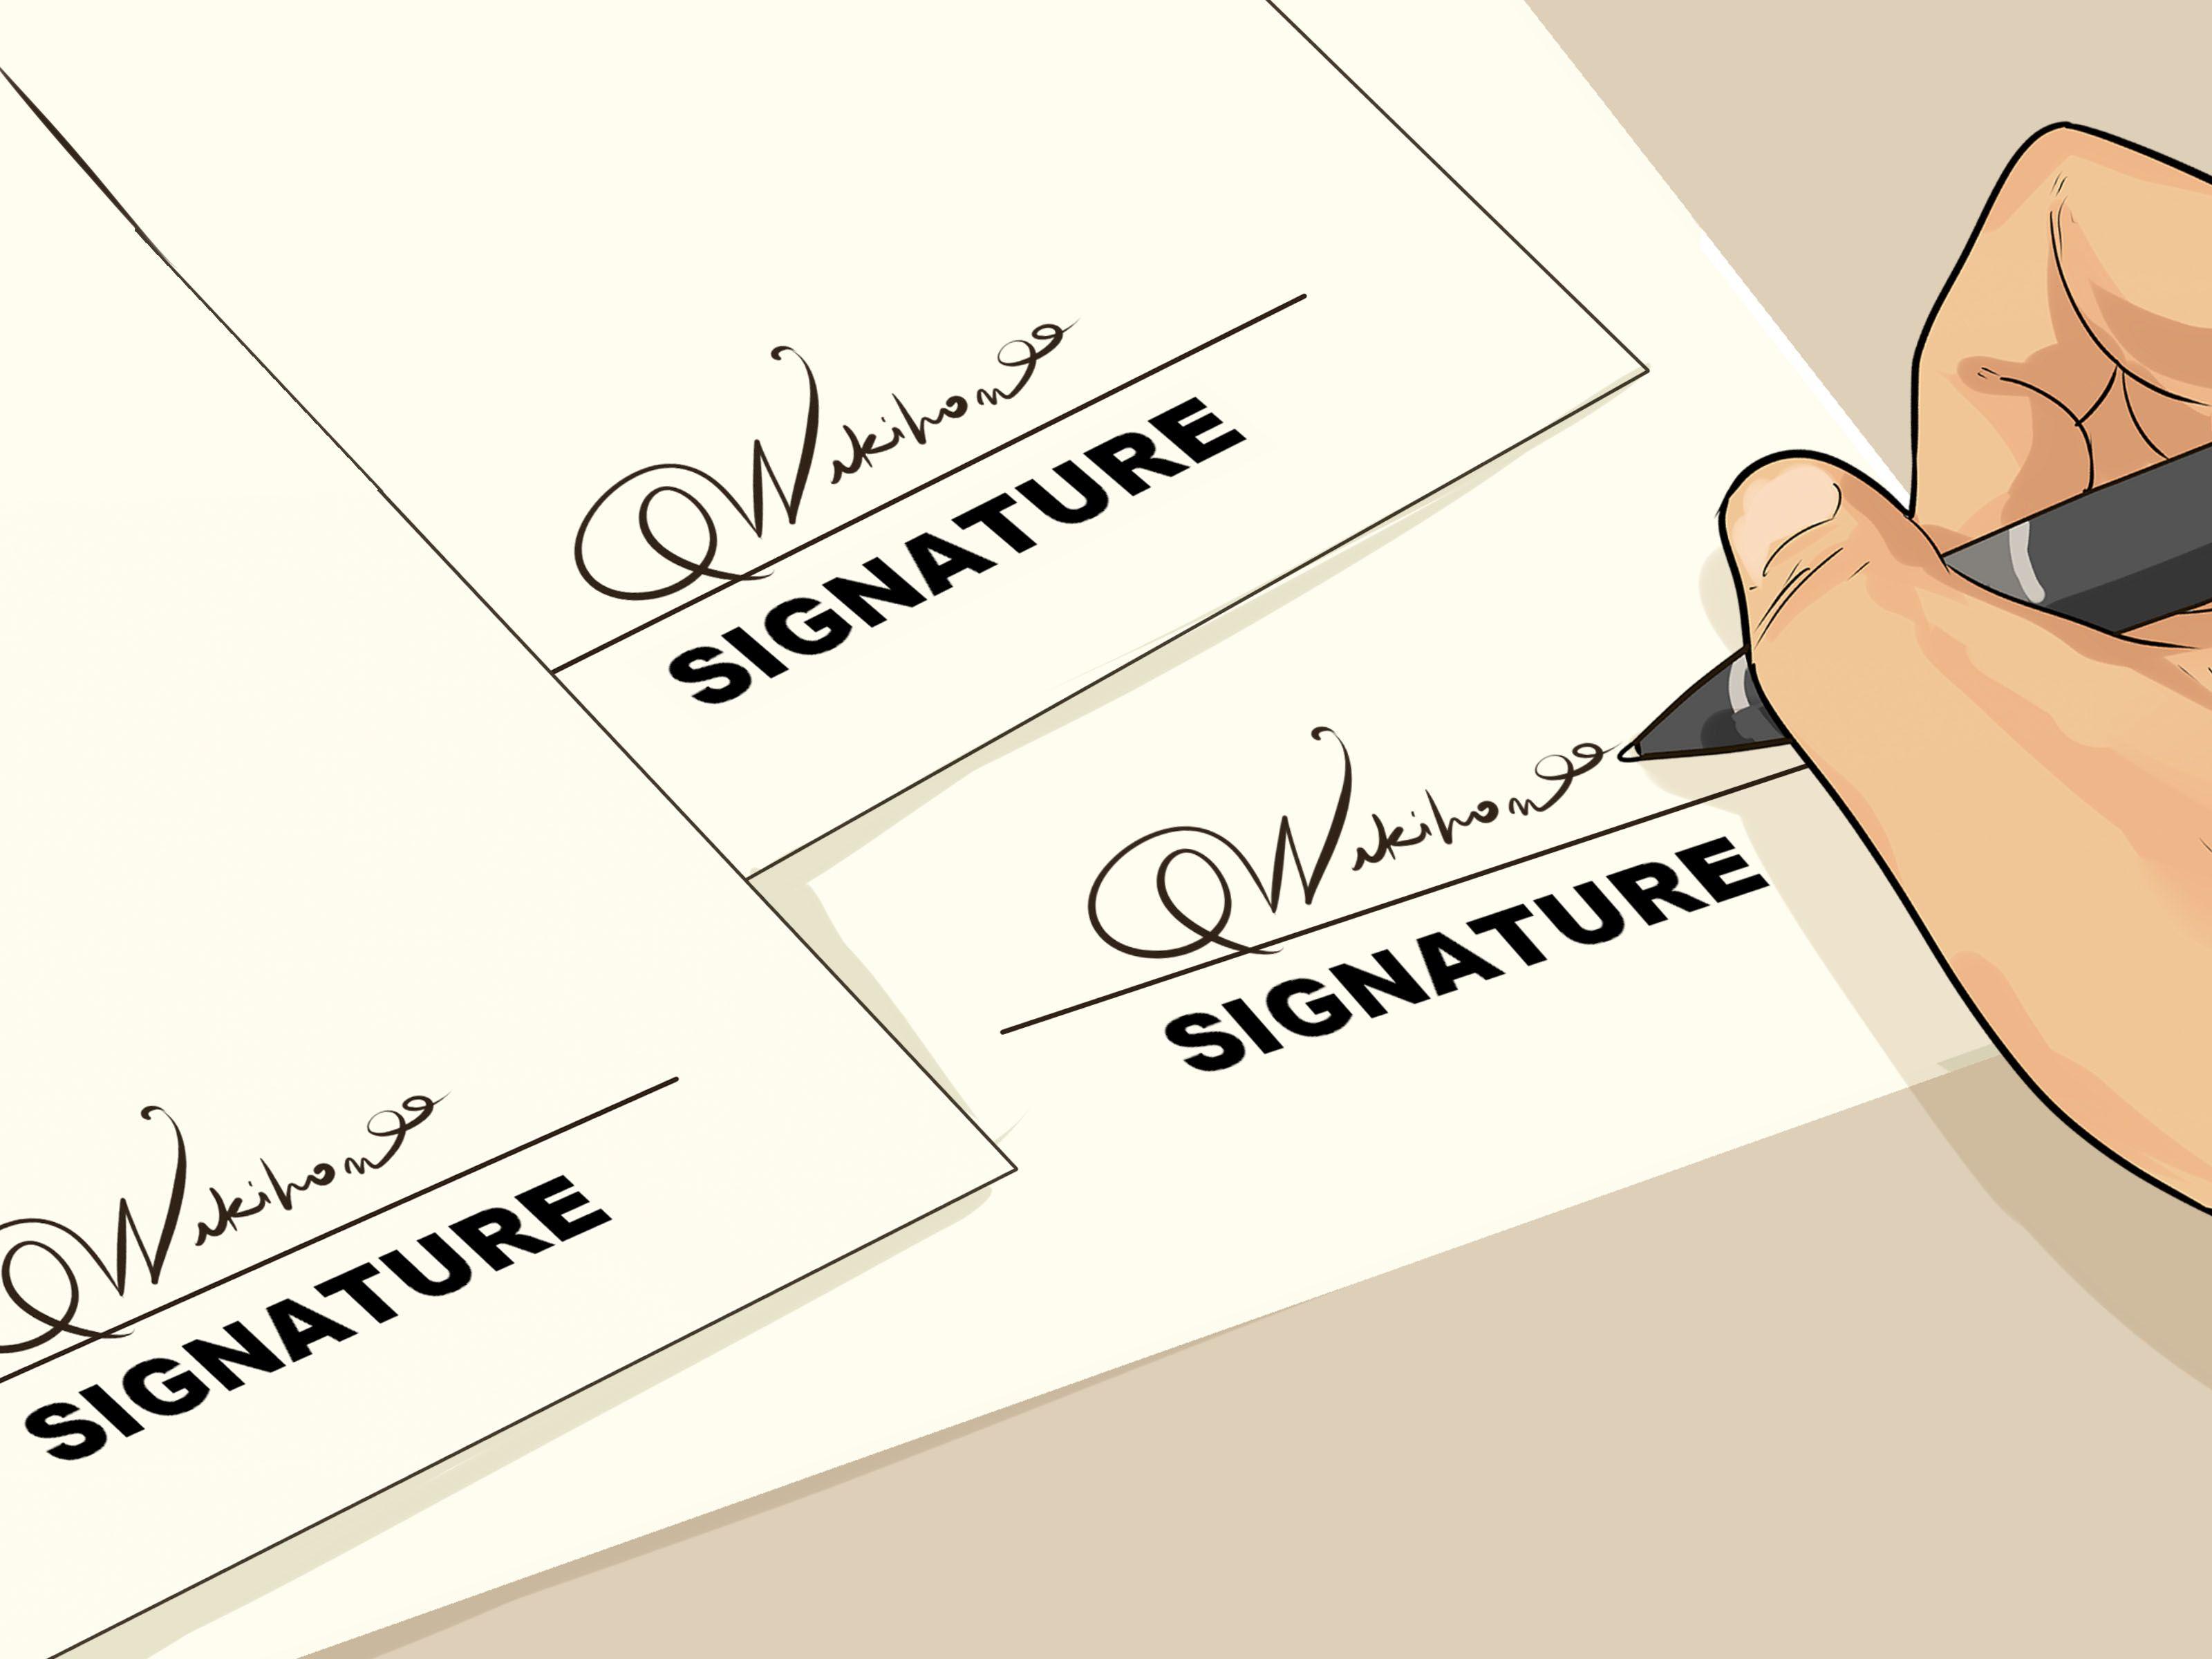 tener una firma cool | firmas | Pinterest | Muy divertido, Probar y ...